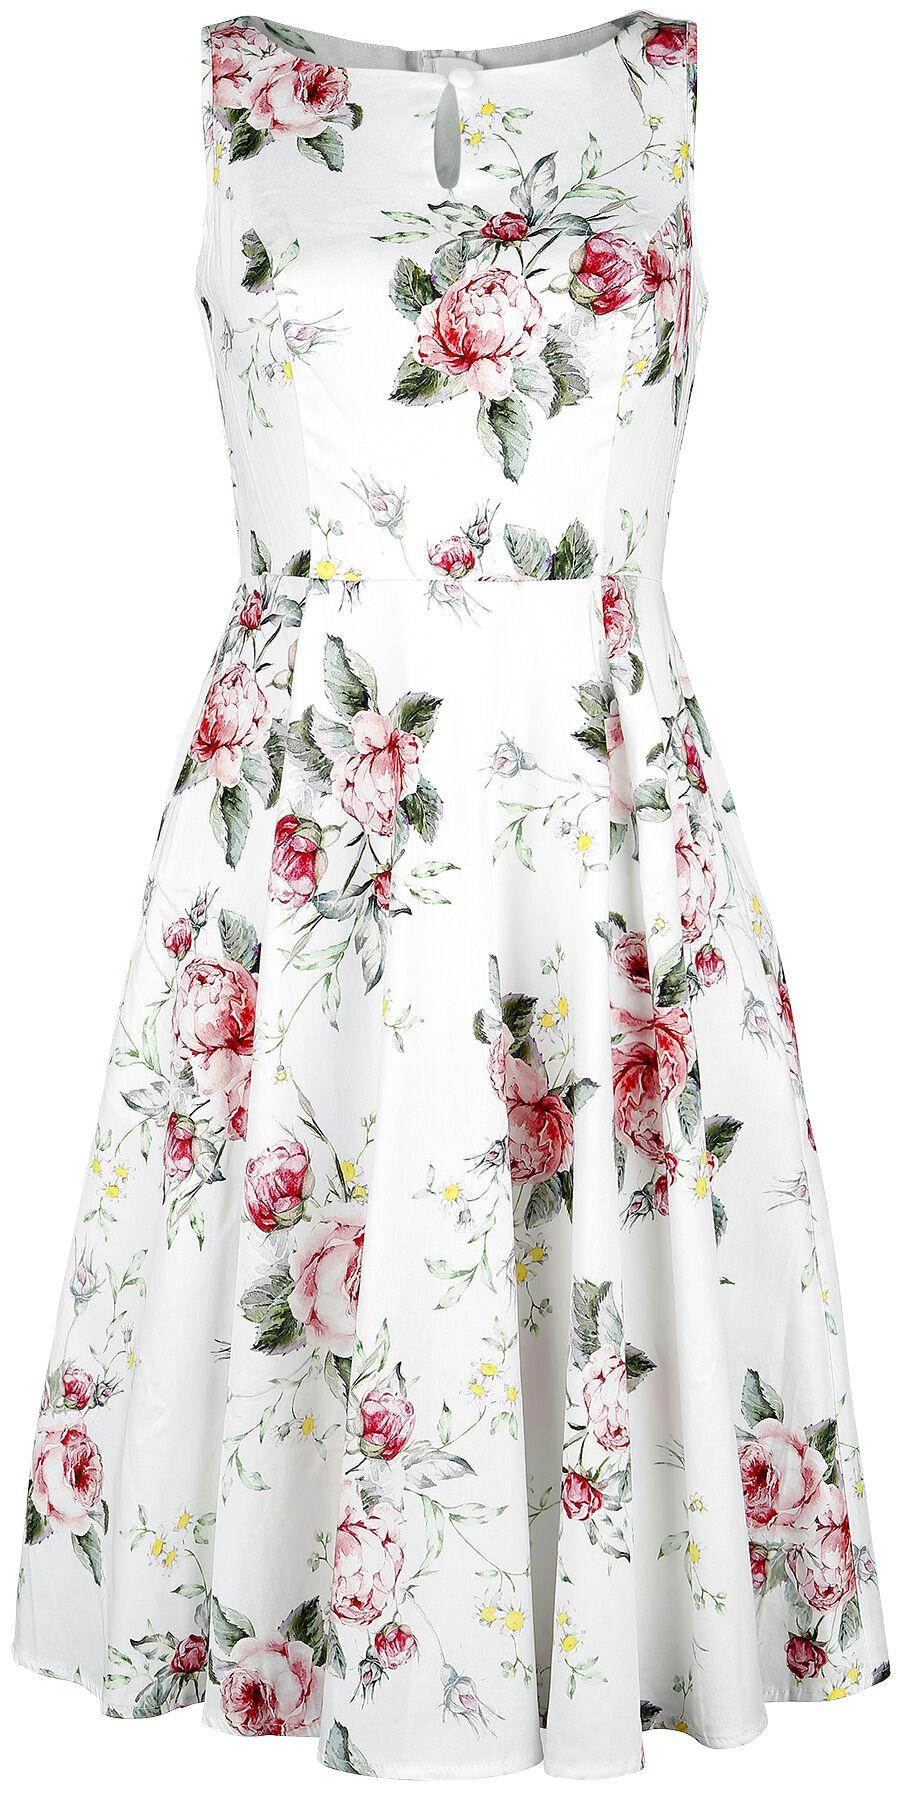 H&R London Rahel Swing Dress  Kurzes Kleid  weiß/rosa